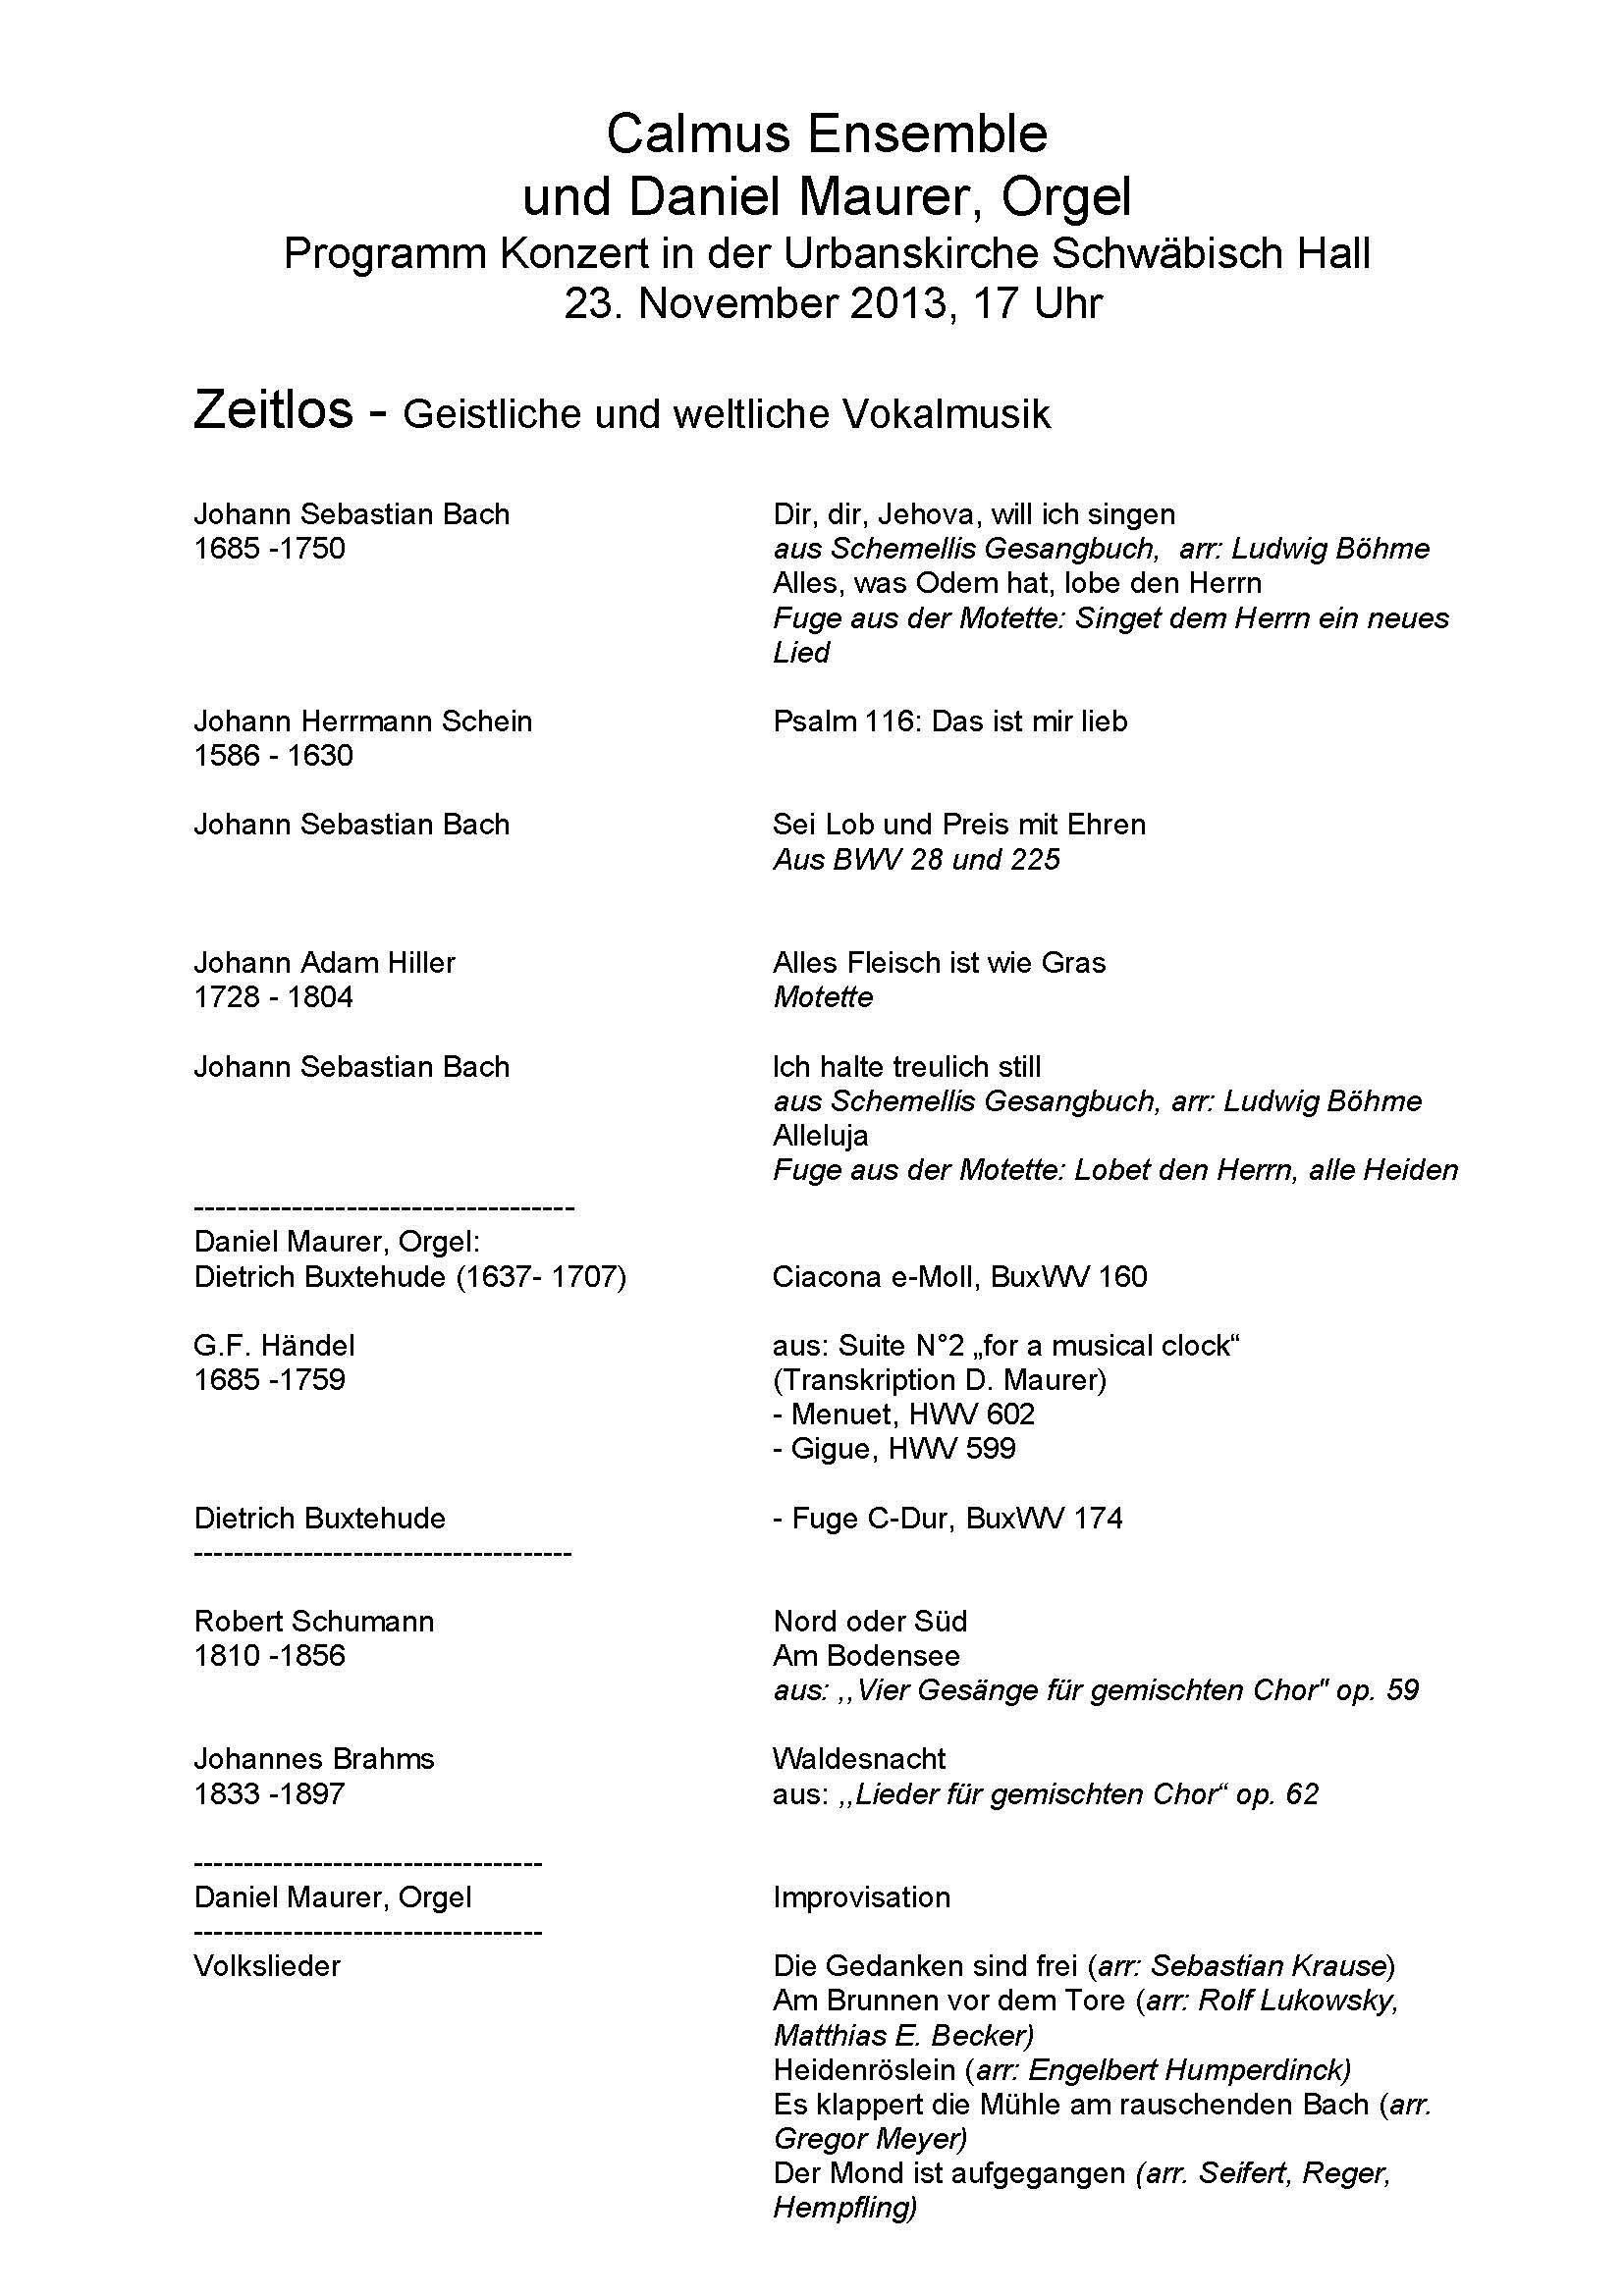 Calamus Ensemble - Programm 23.11.2013